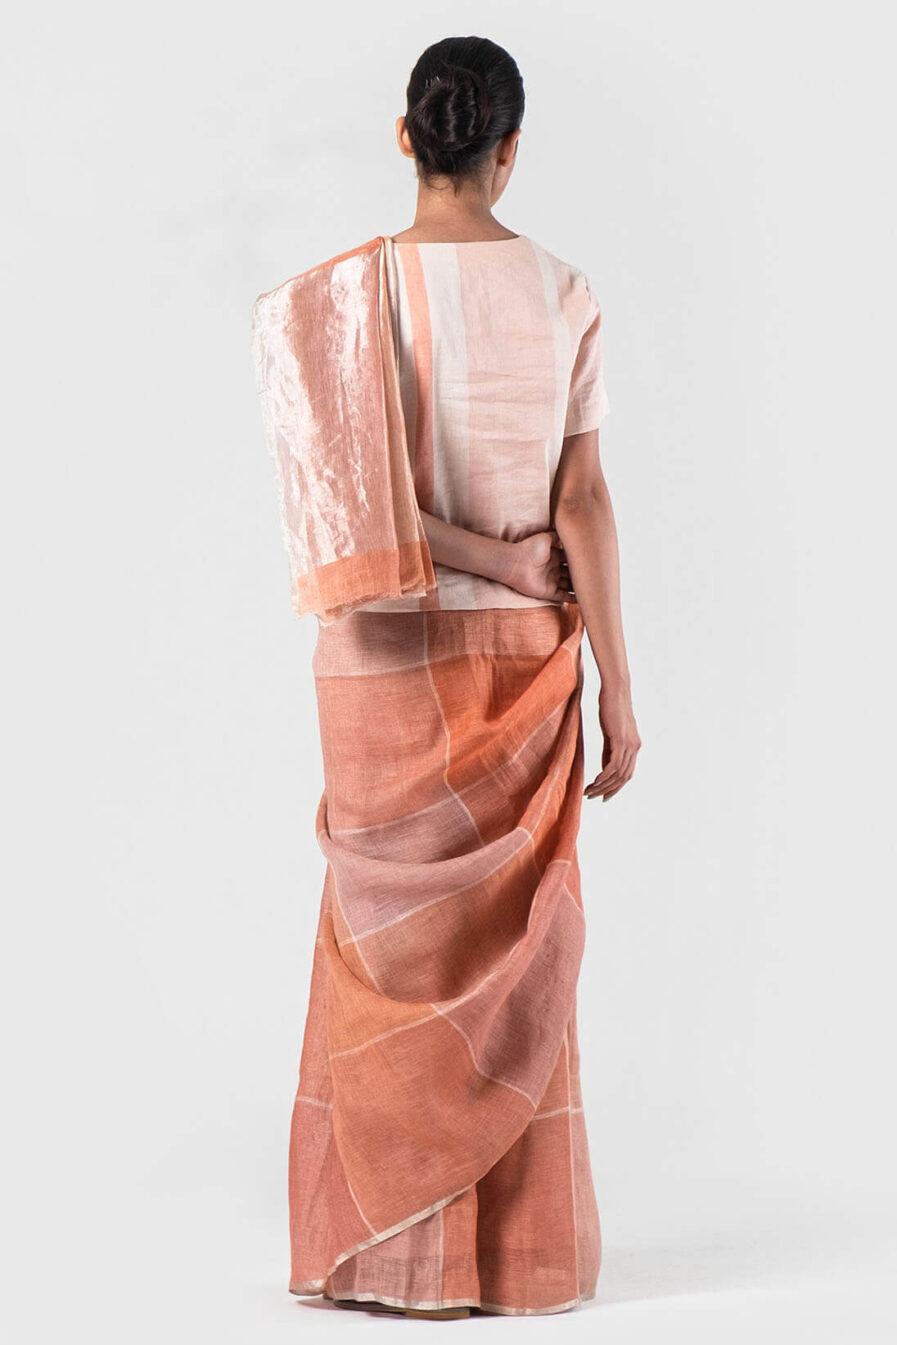 Anavila Salmon Summer checkered sari